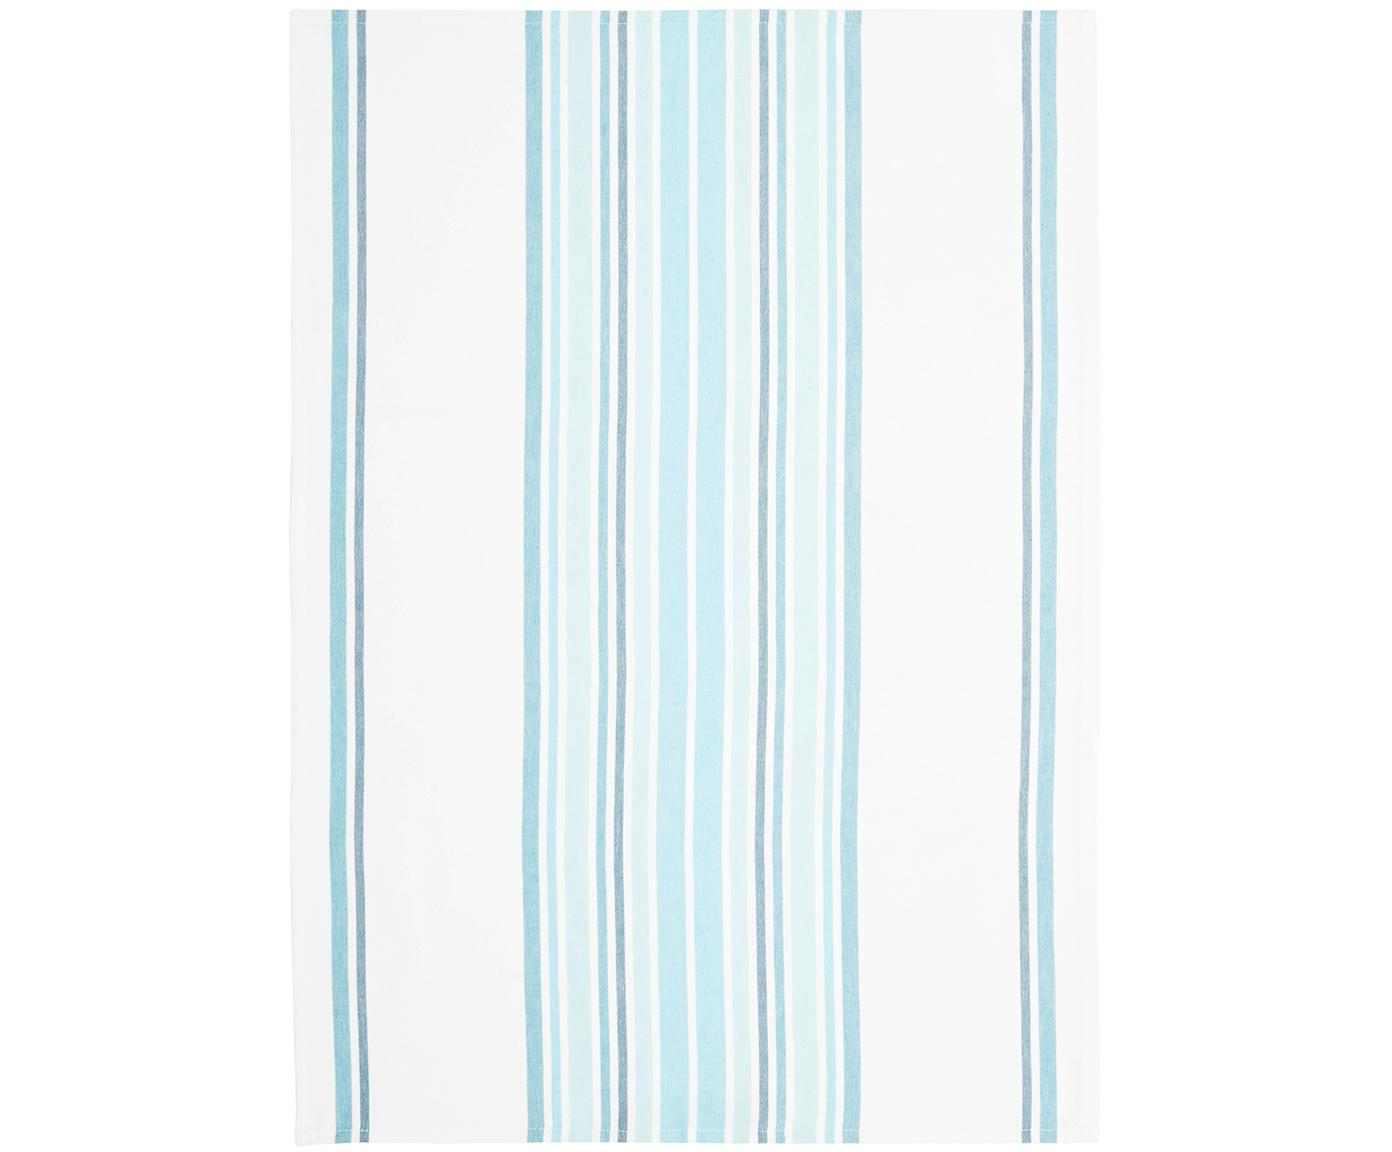 Geschirrtücher Katie, 2 Stück, Baumwolle, Weiss, Blau, 50 x 70 cm